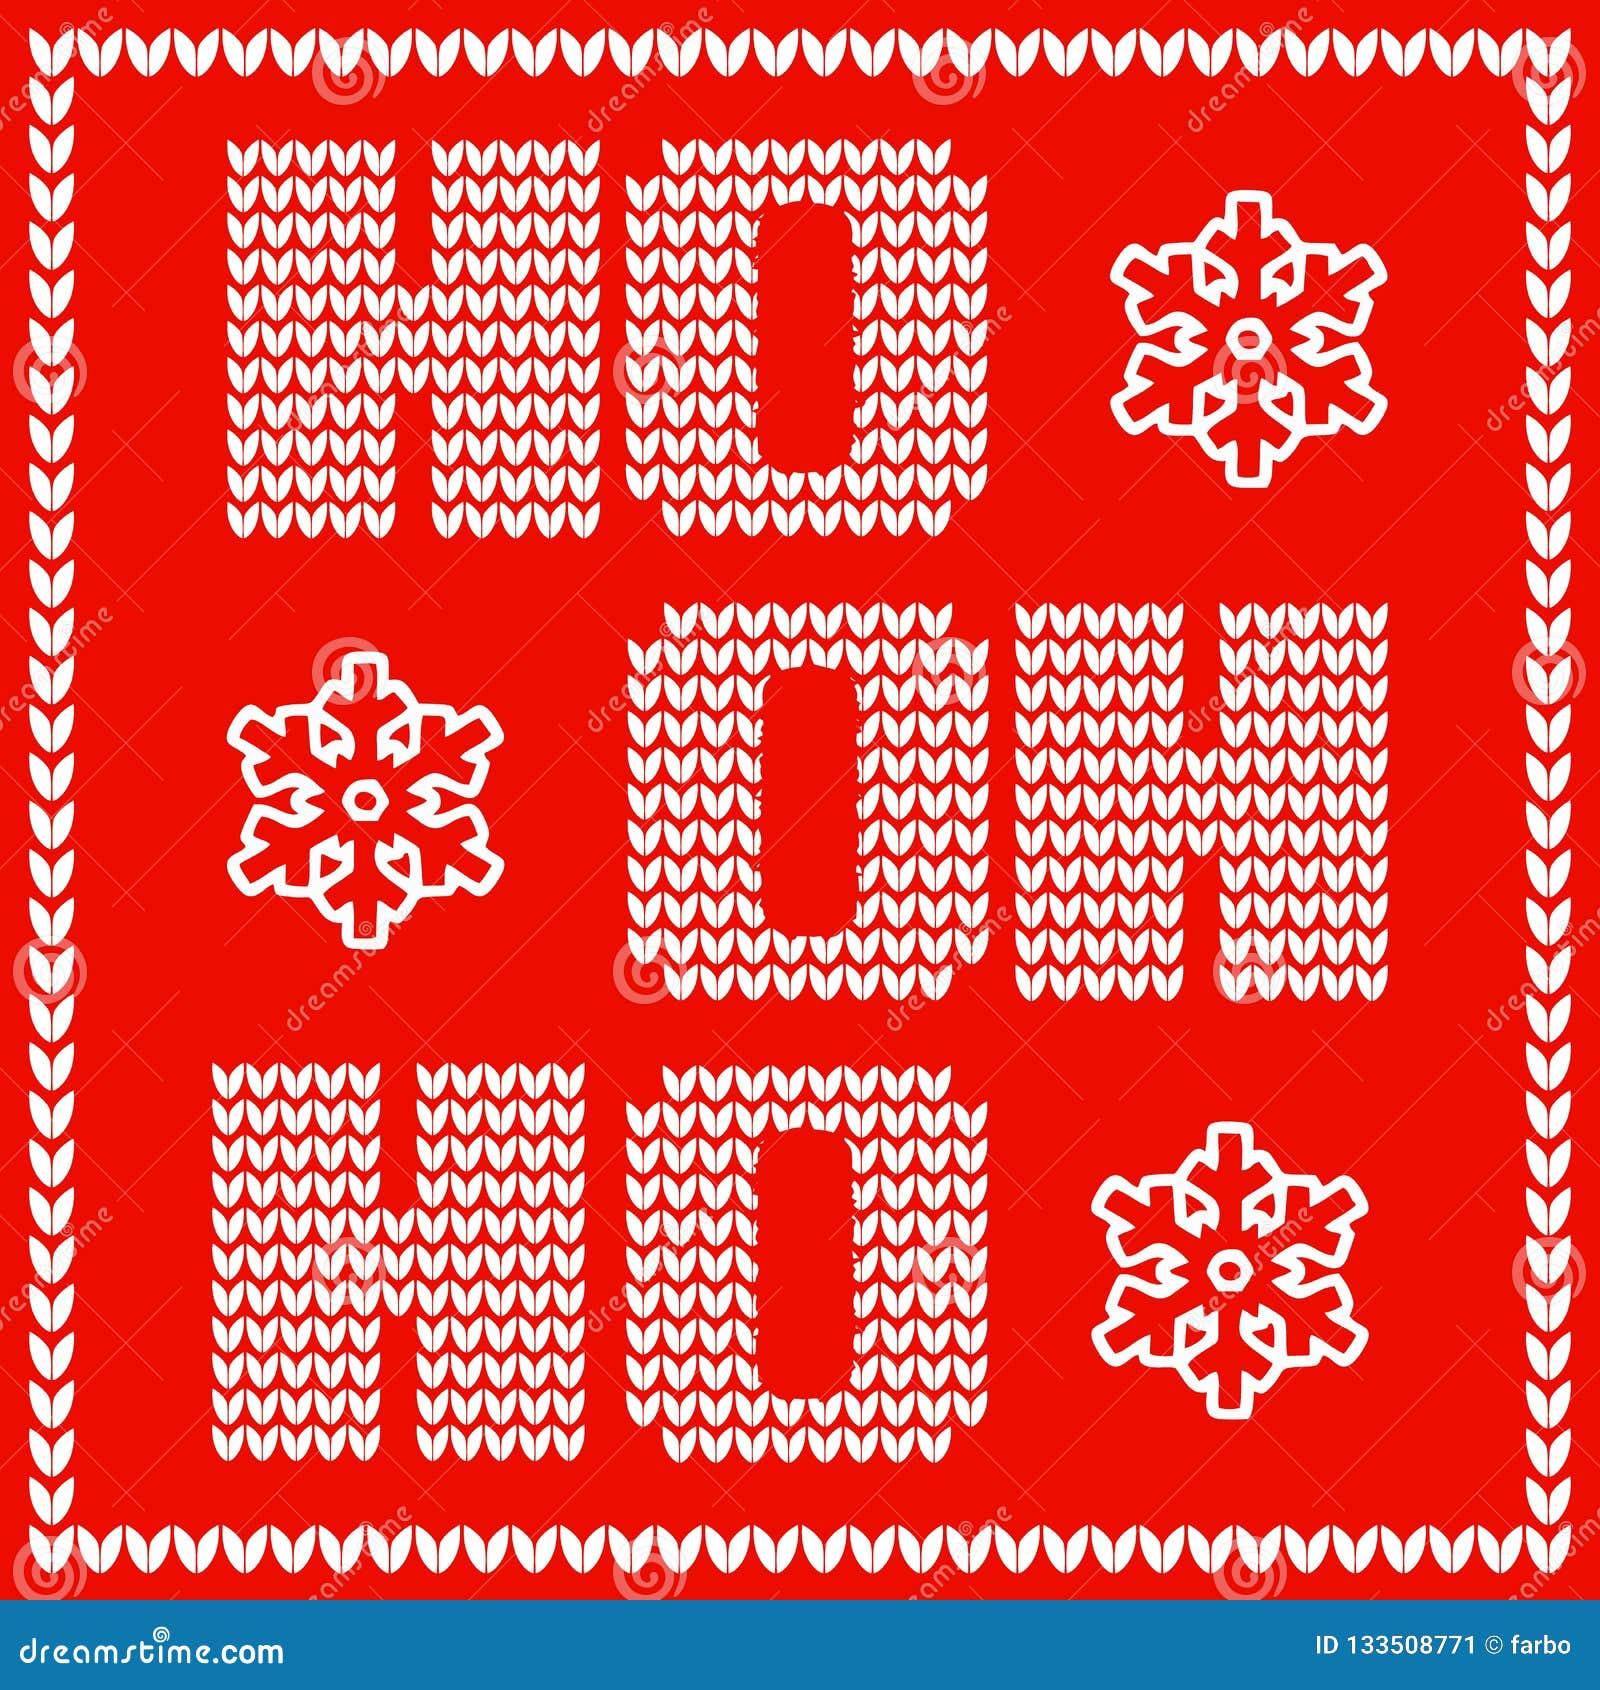 Christmas card design with knitted santas sayings words ho ho ho